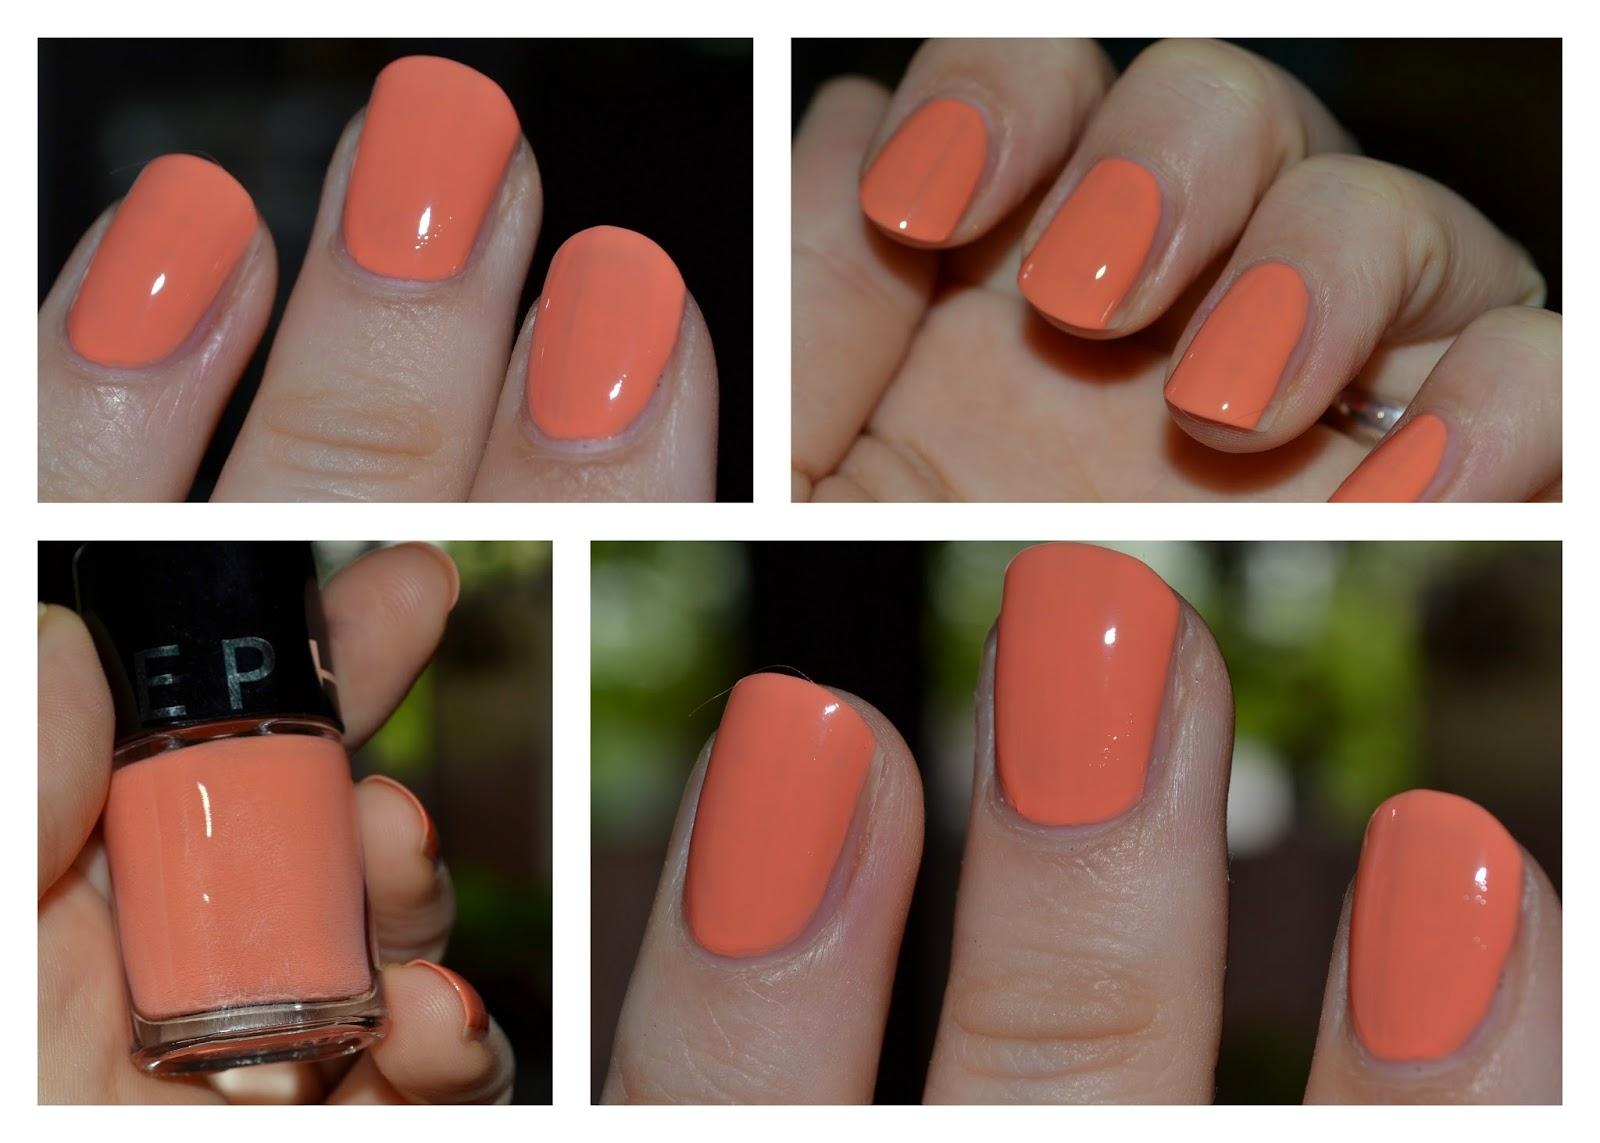 sephora-m-maybe-nail-polish